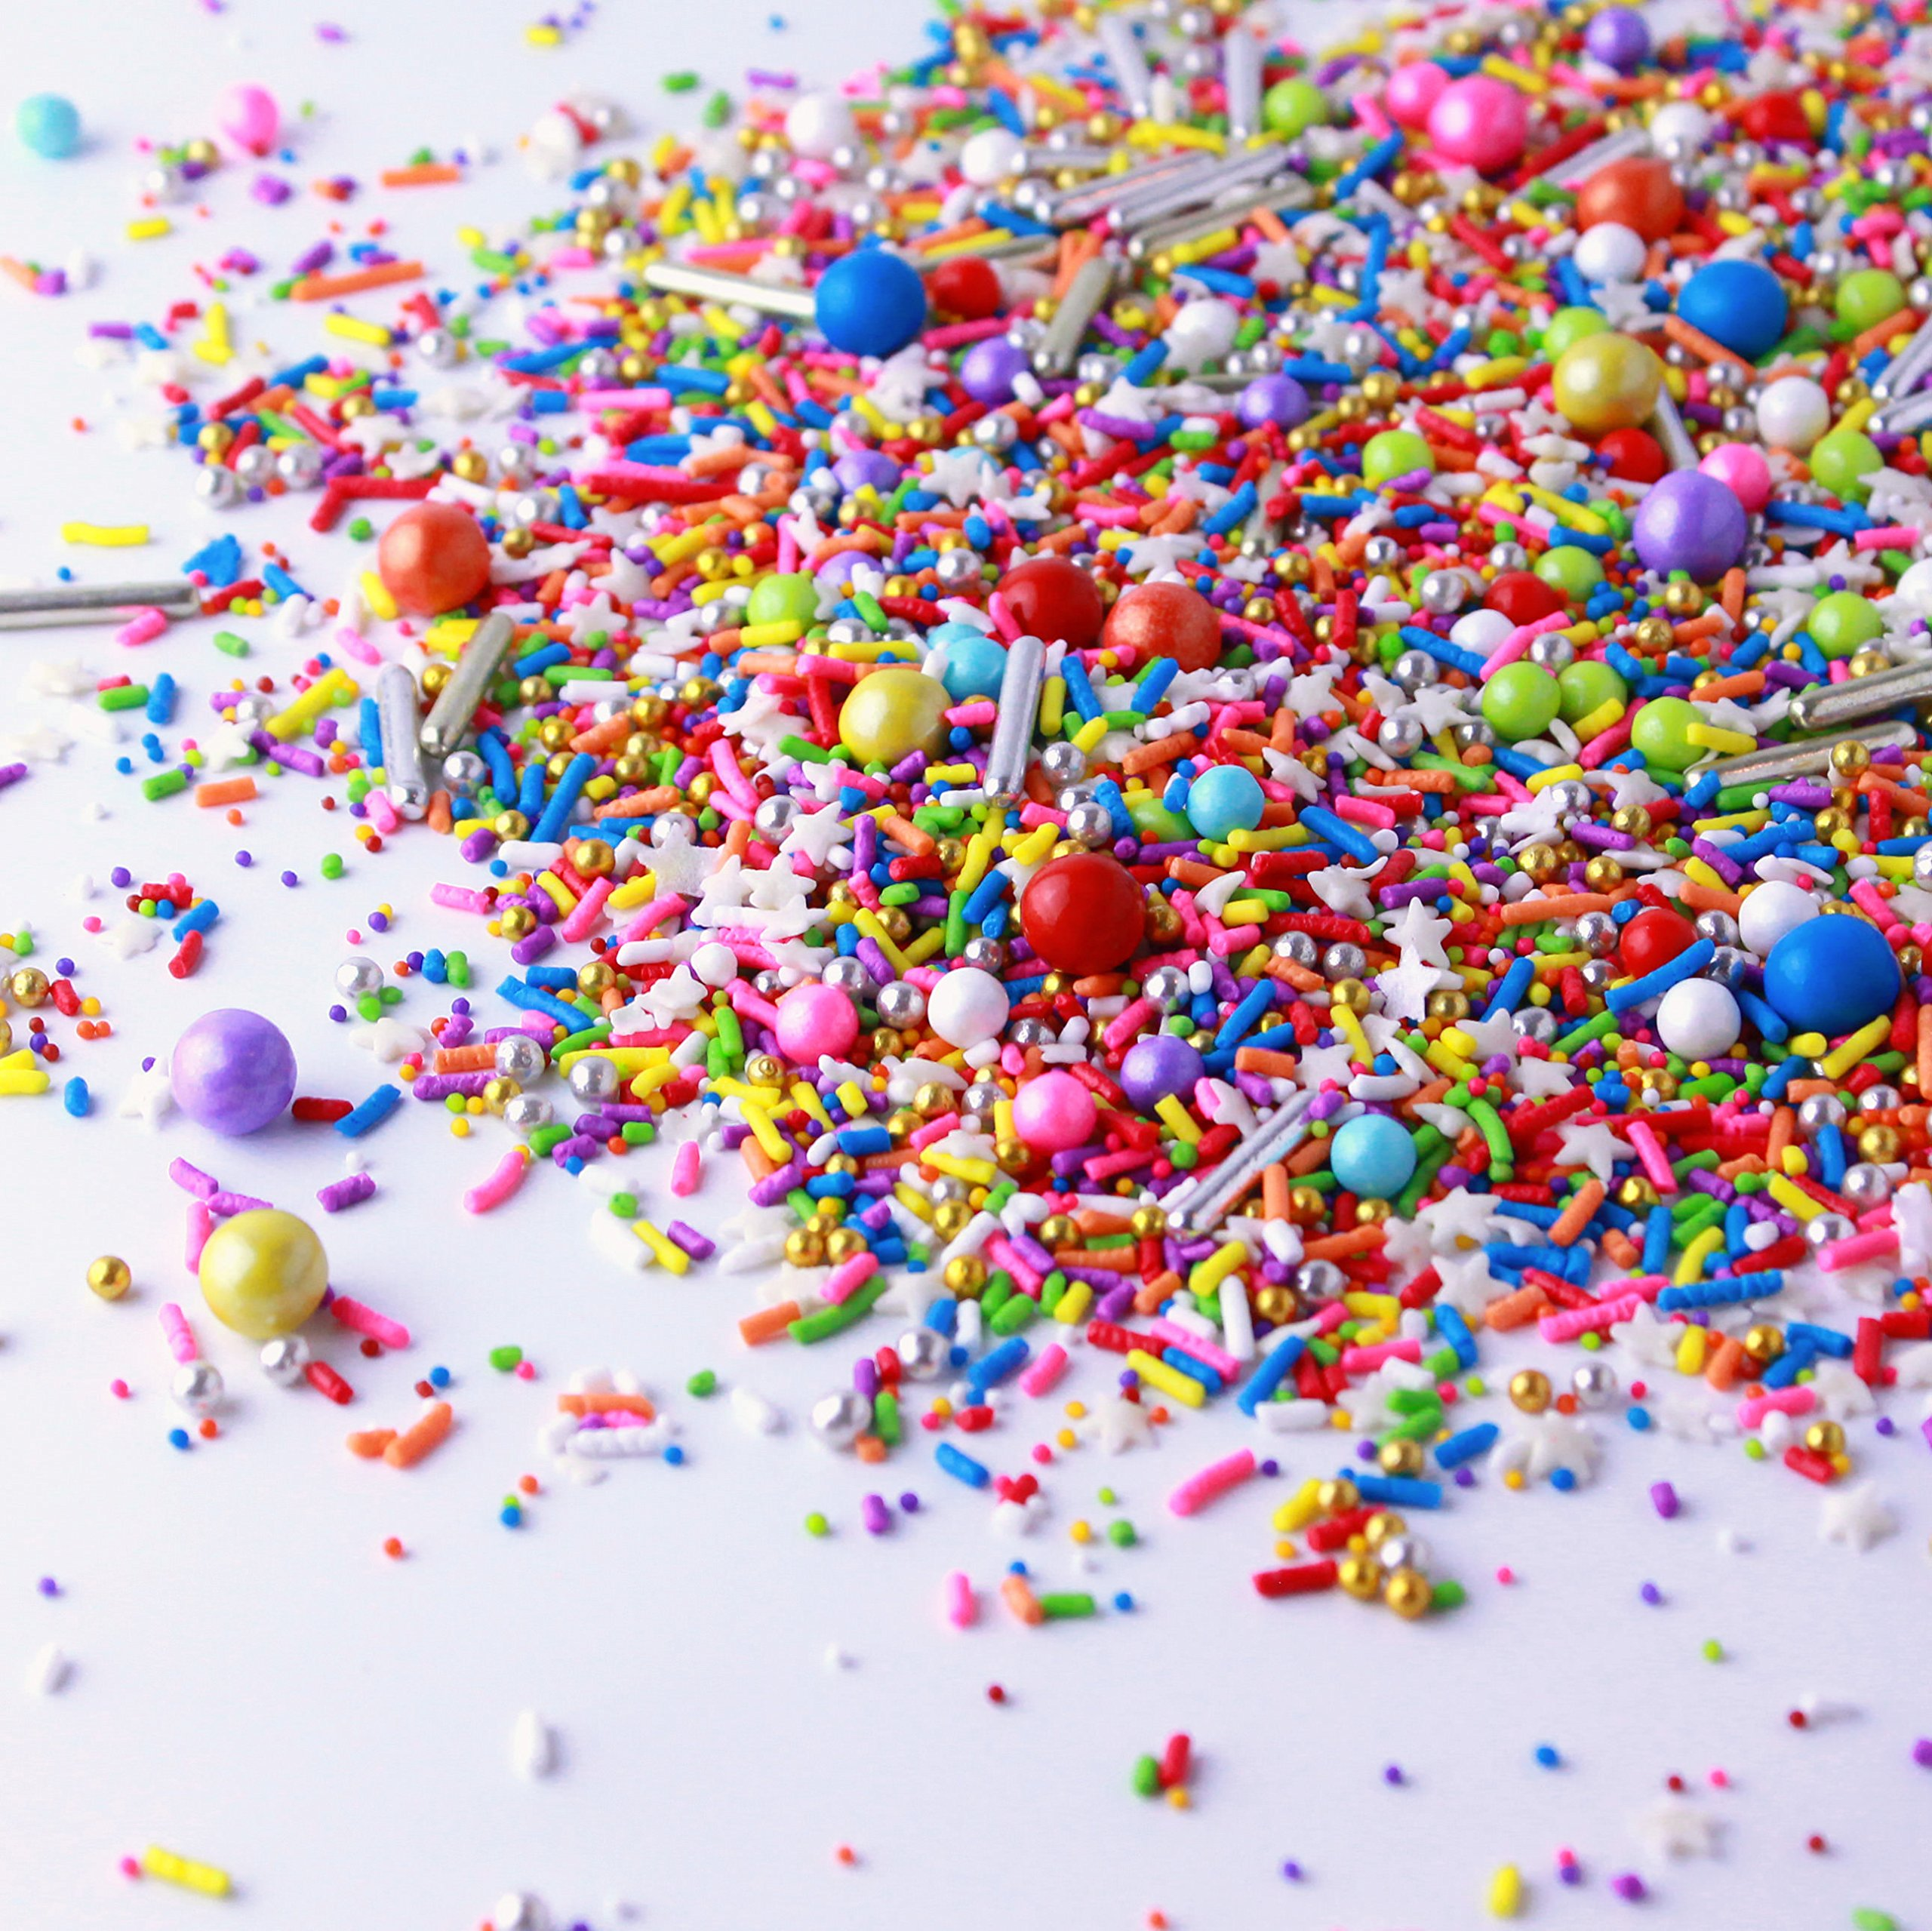 Rainbow Road Sprinkle Mix, Birthday Sprinkles, Cake Sprinkles, Metallic Sprinkles, Unicorn Sprinkles, 2oz by SPRINKLE POP